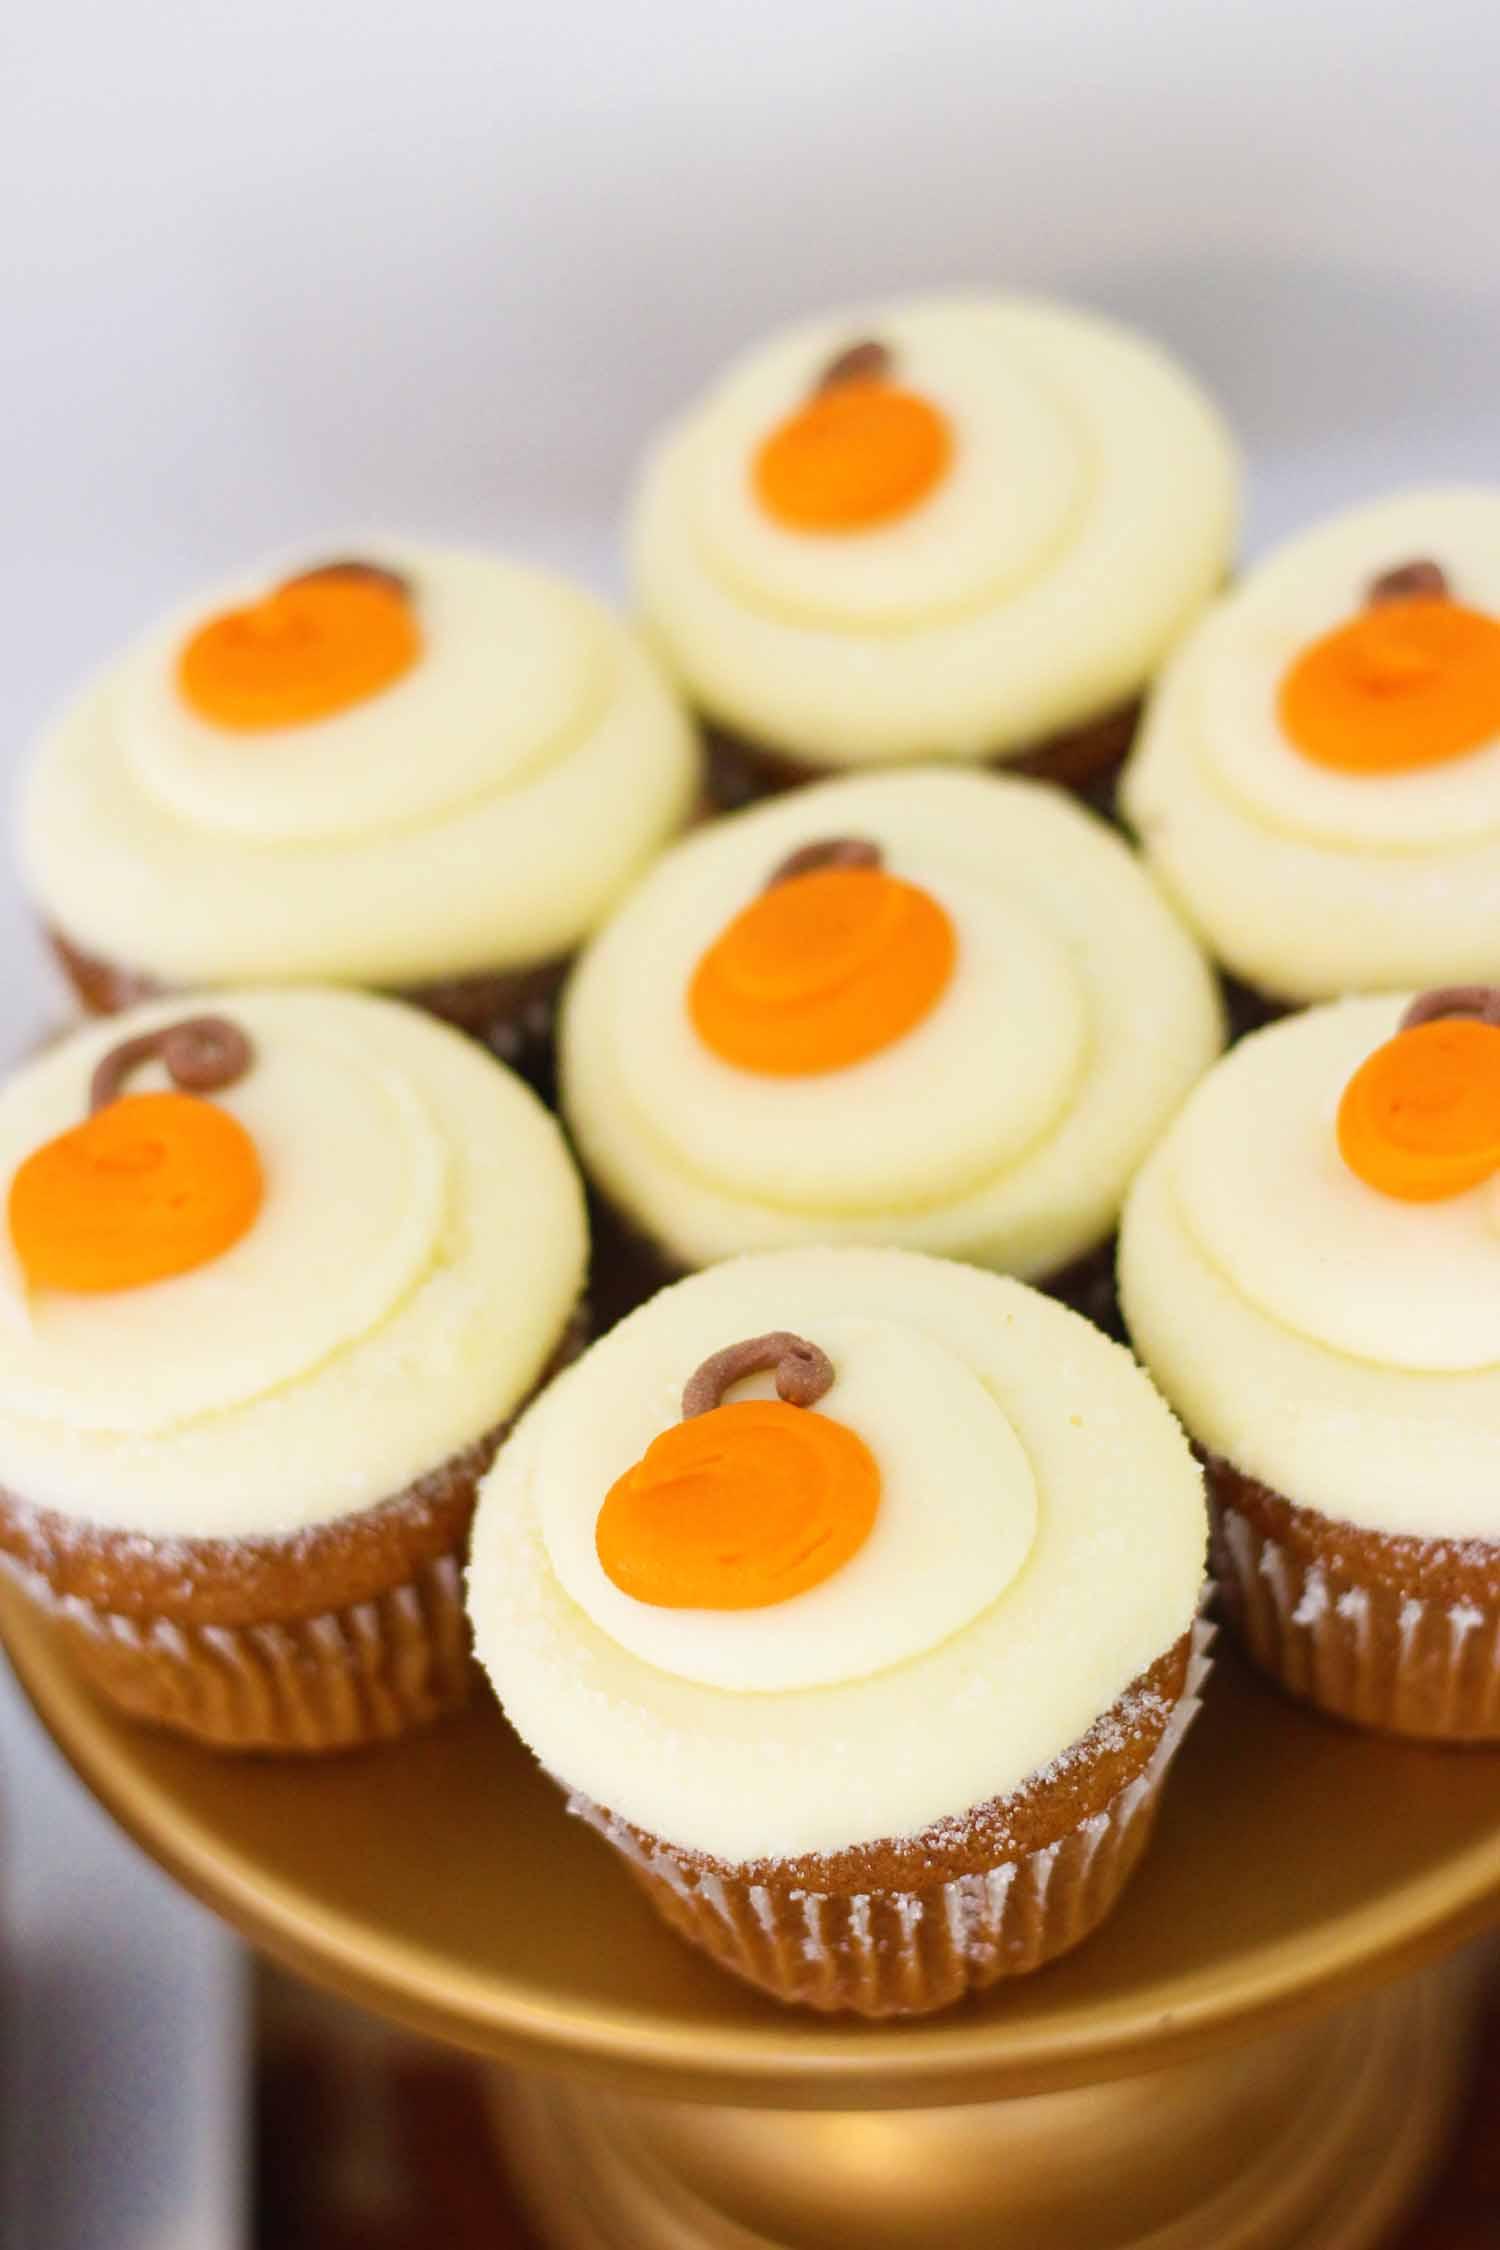 Pumkin Cupcakes With Cake Mix